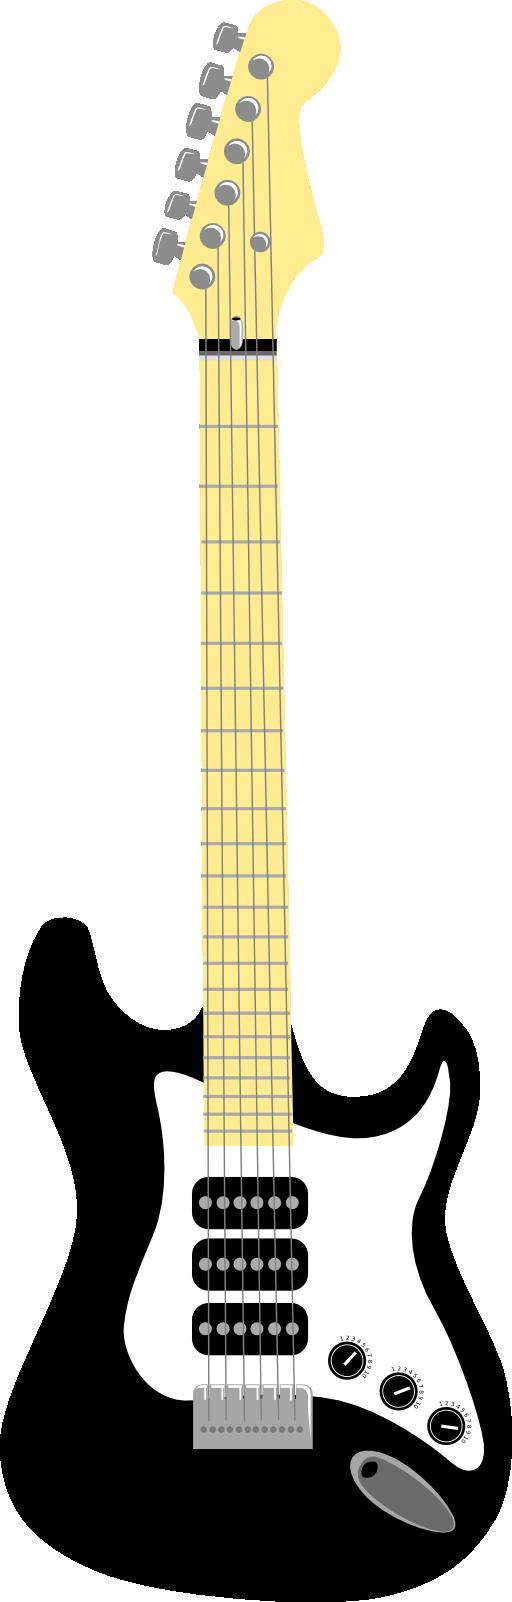 clipart freeuse Guitar Clip Art Image